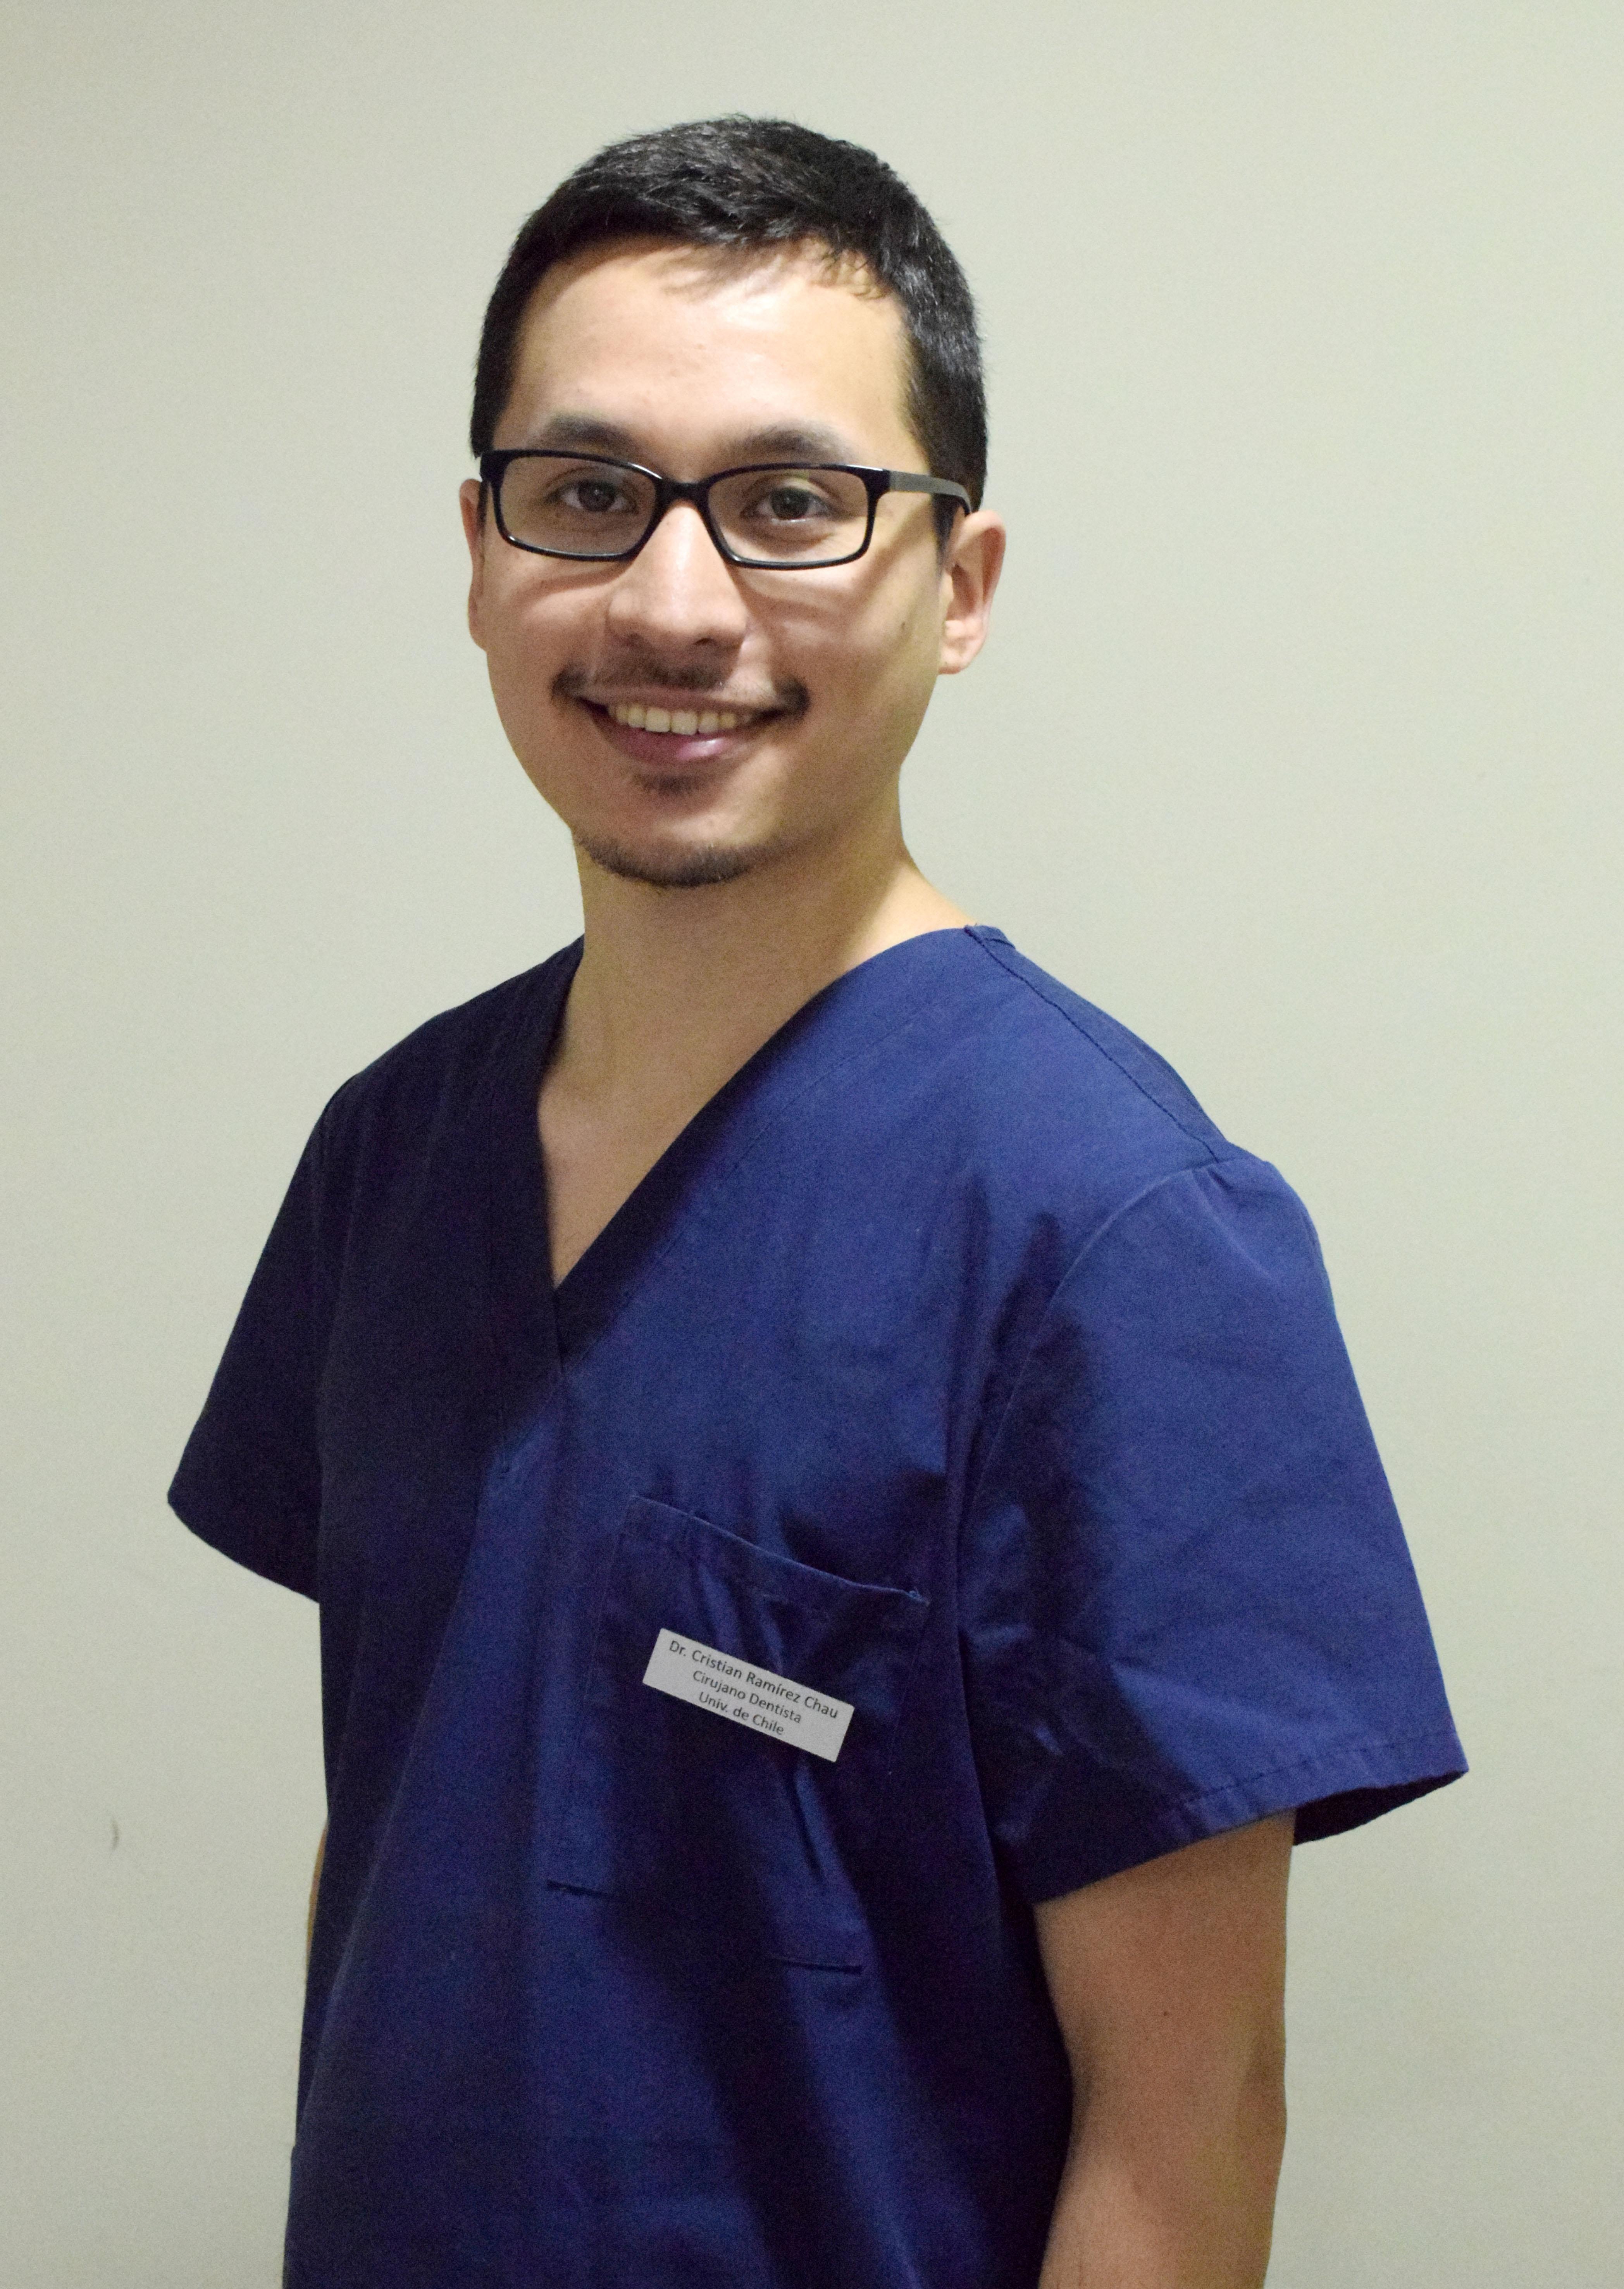 DR CRISTIAN RAMIREZ